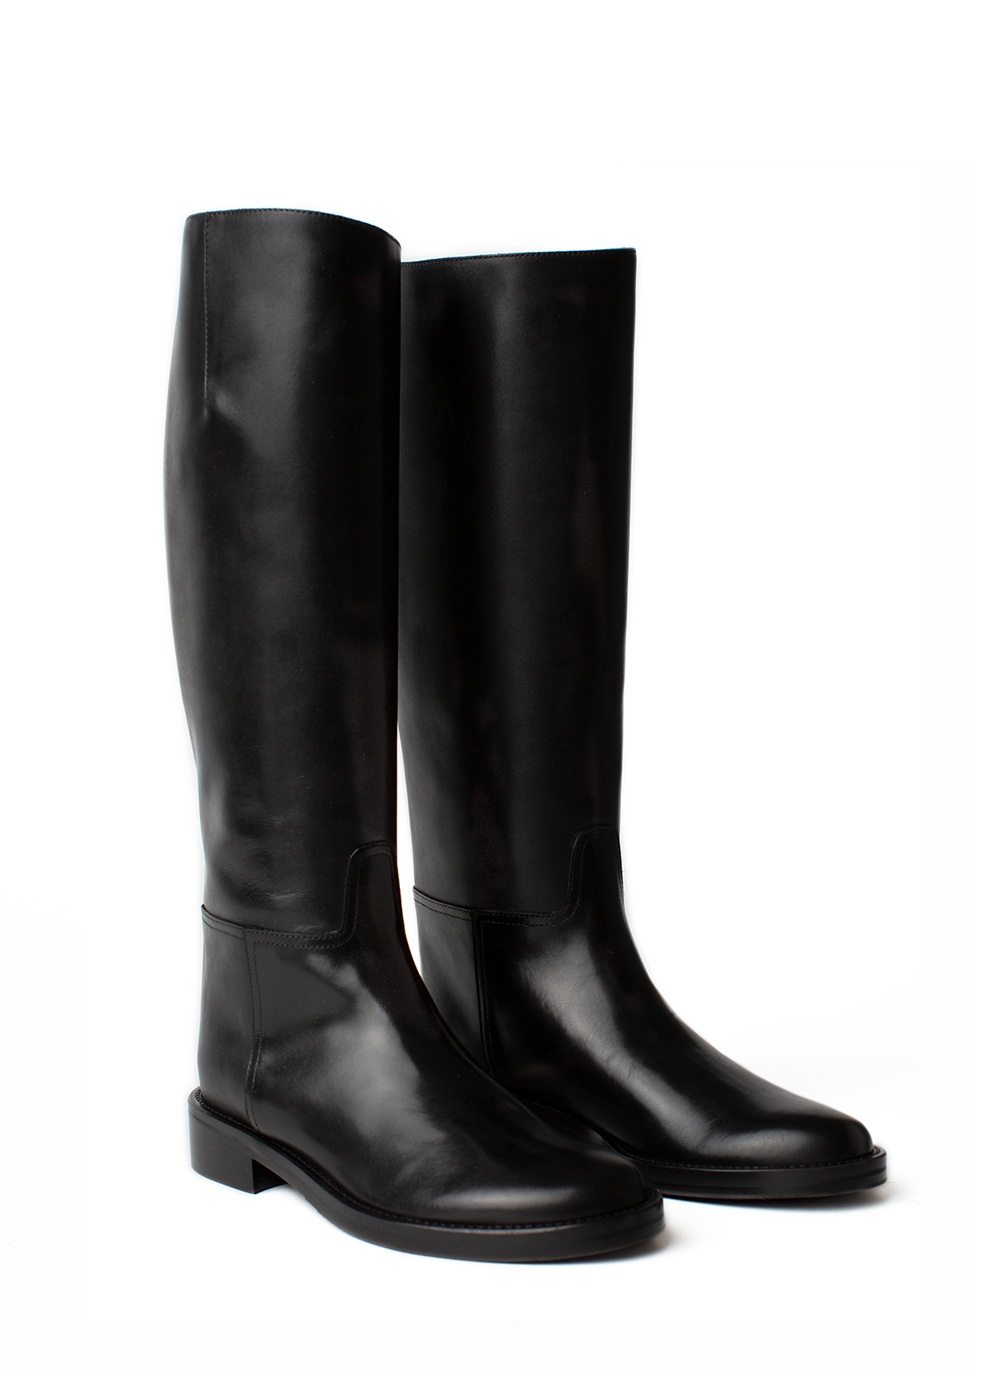 Riding Boots, black